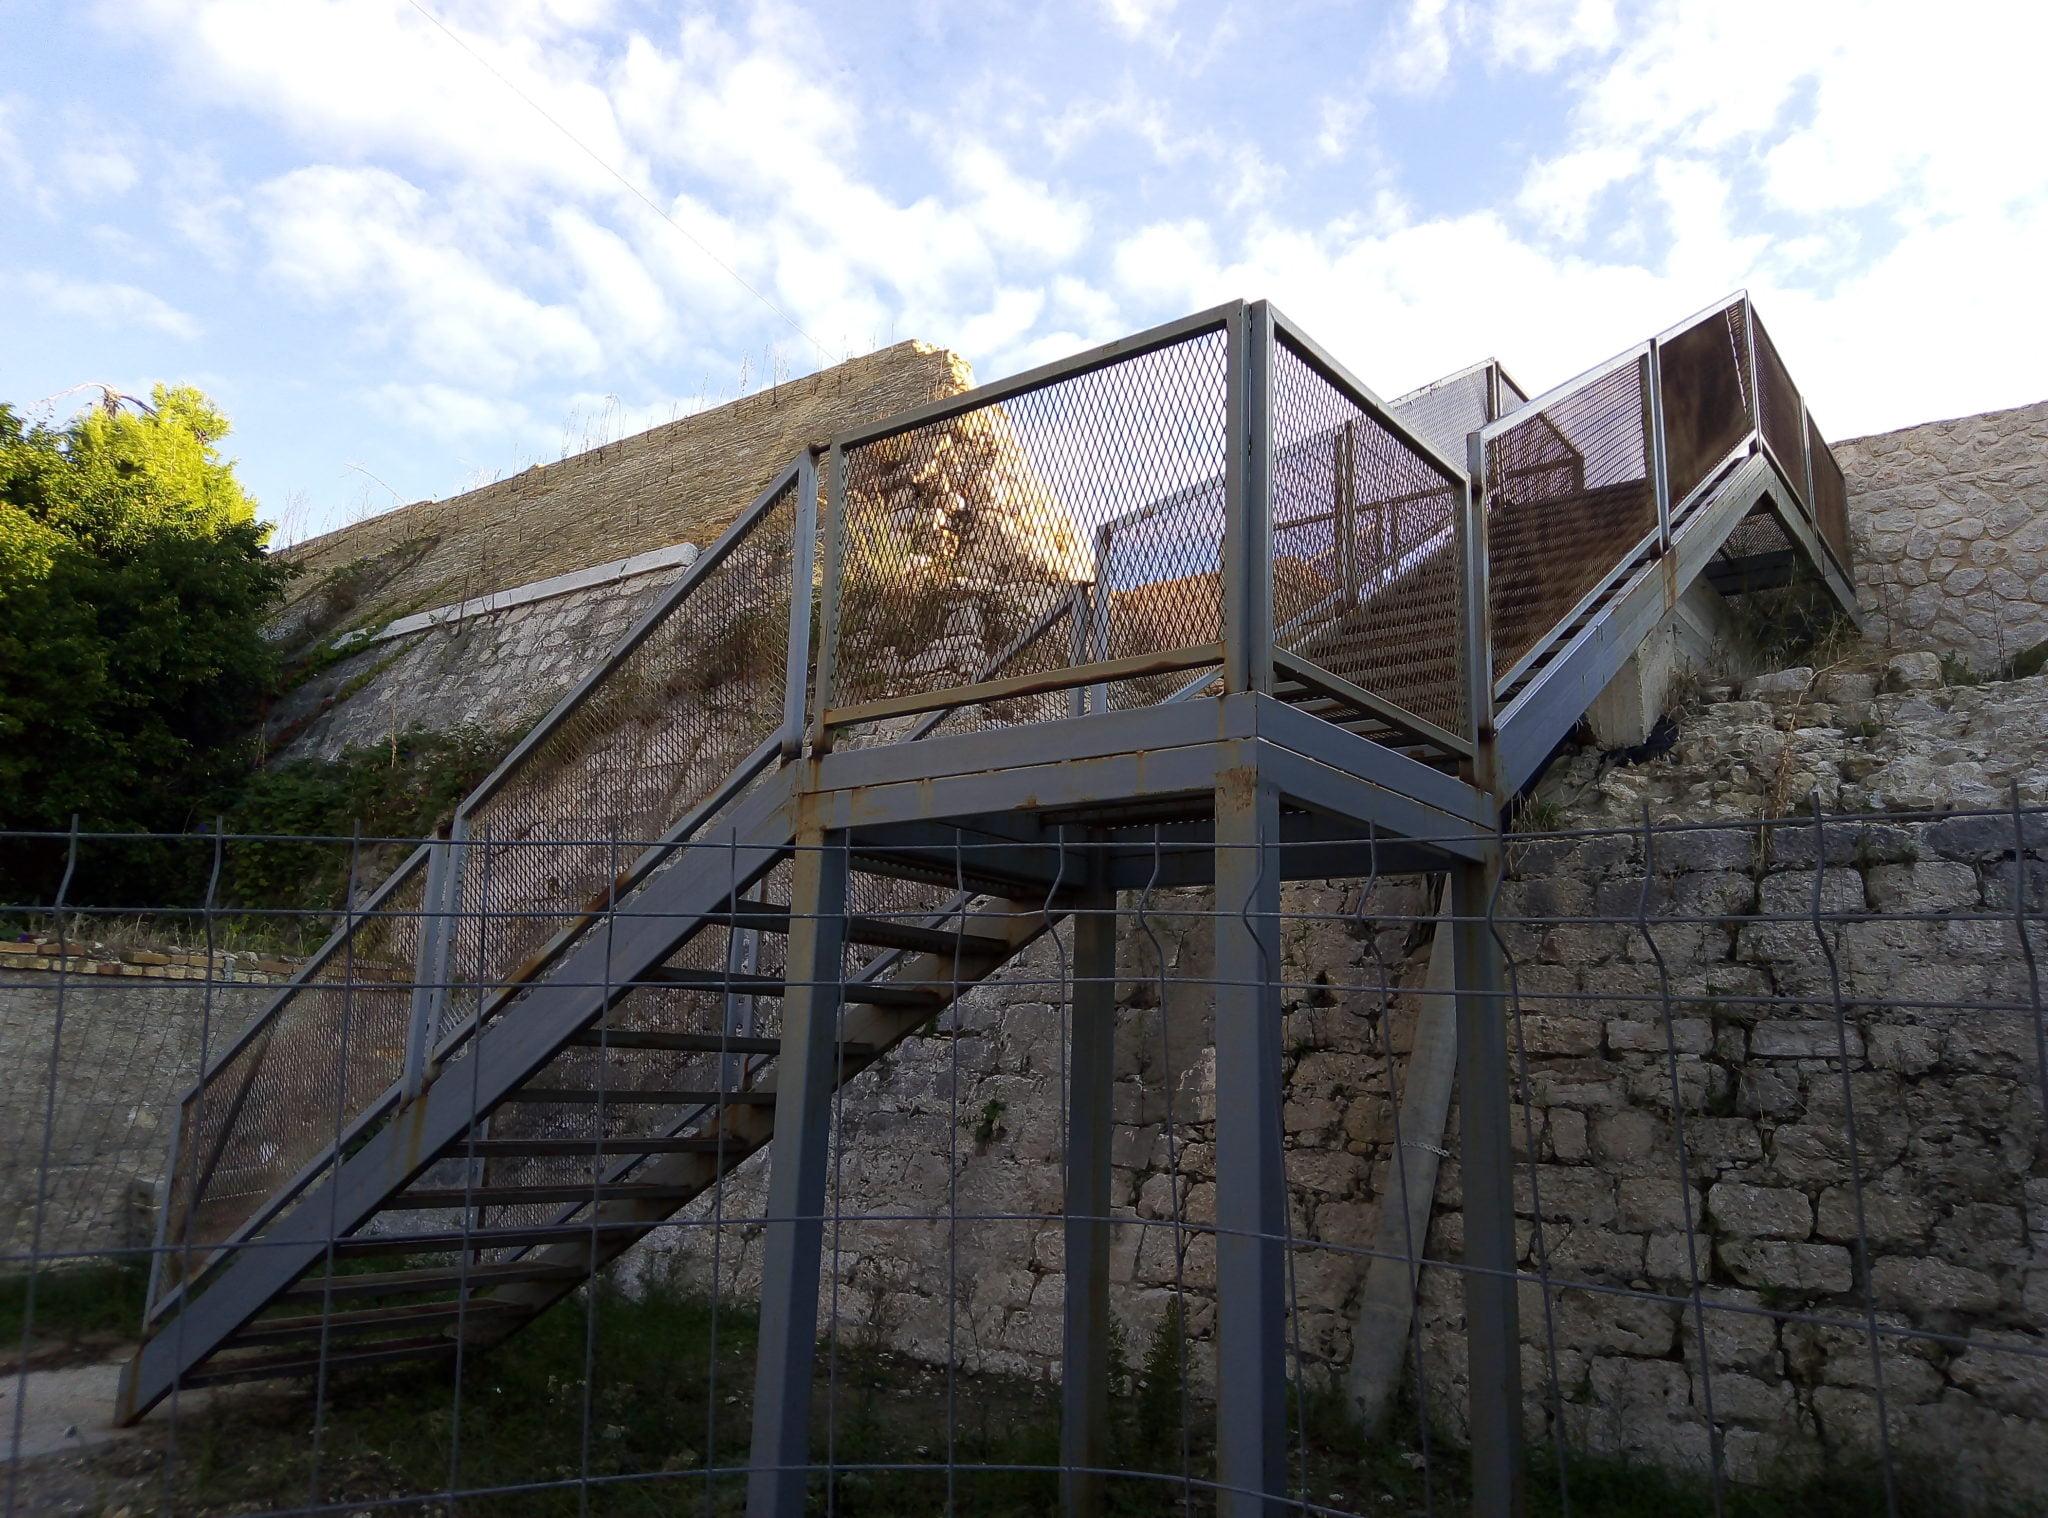 Photo of Πετσόκοψαν αρχαίο τείχος για να τοποθετήσουν μεταλλική σκάλα στη Κέρκυρα